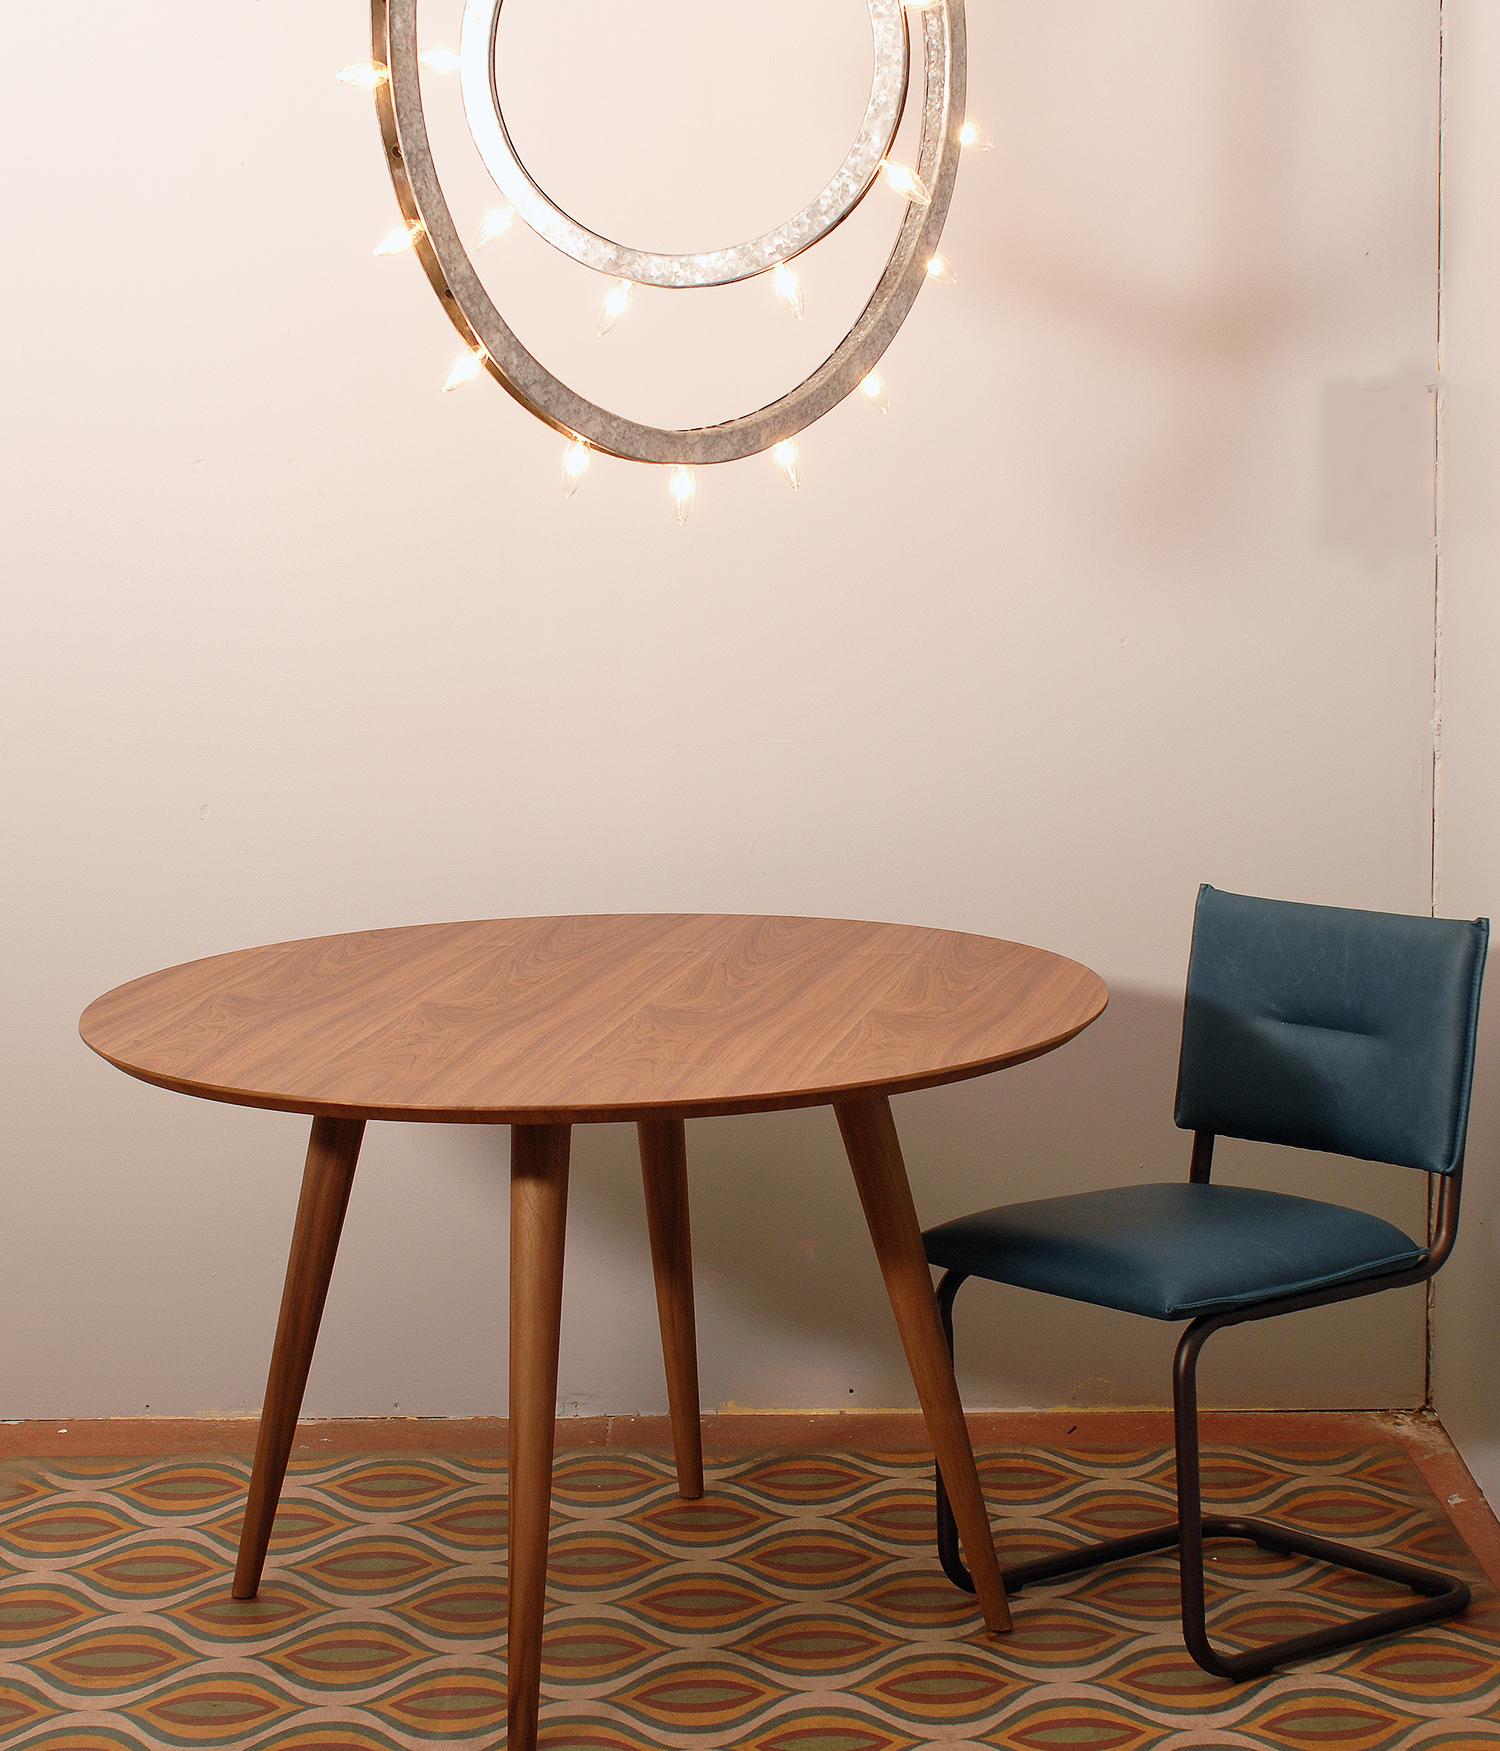 Tables Harrington Galleries | San Francisco, CA